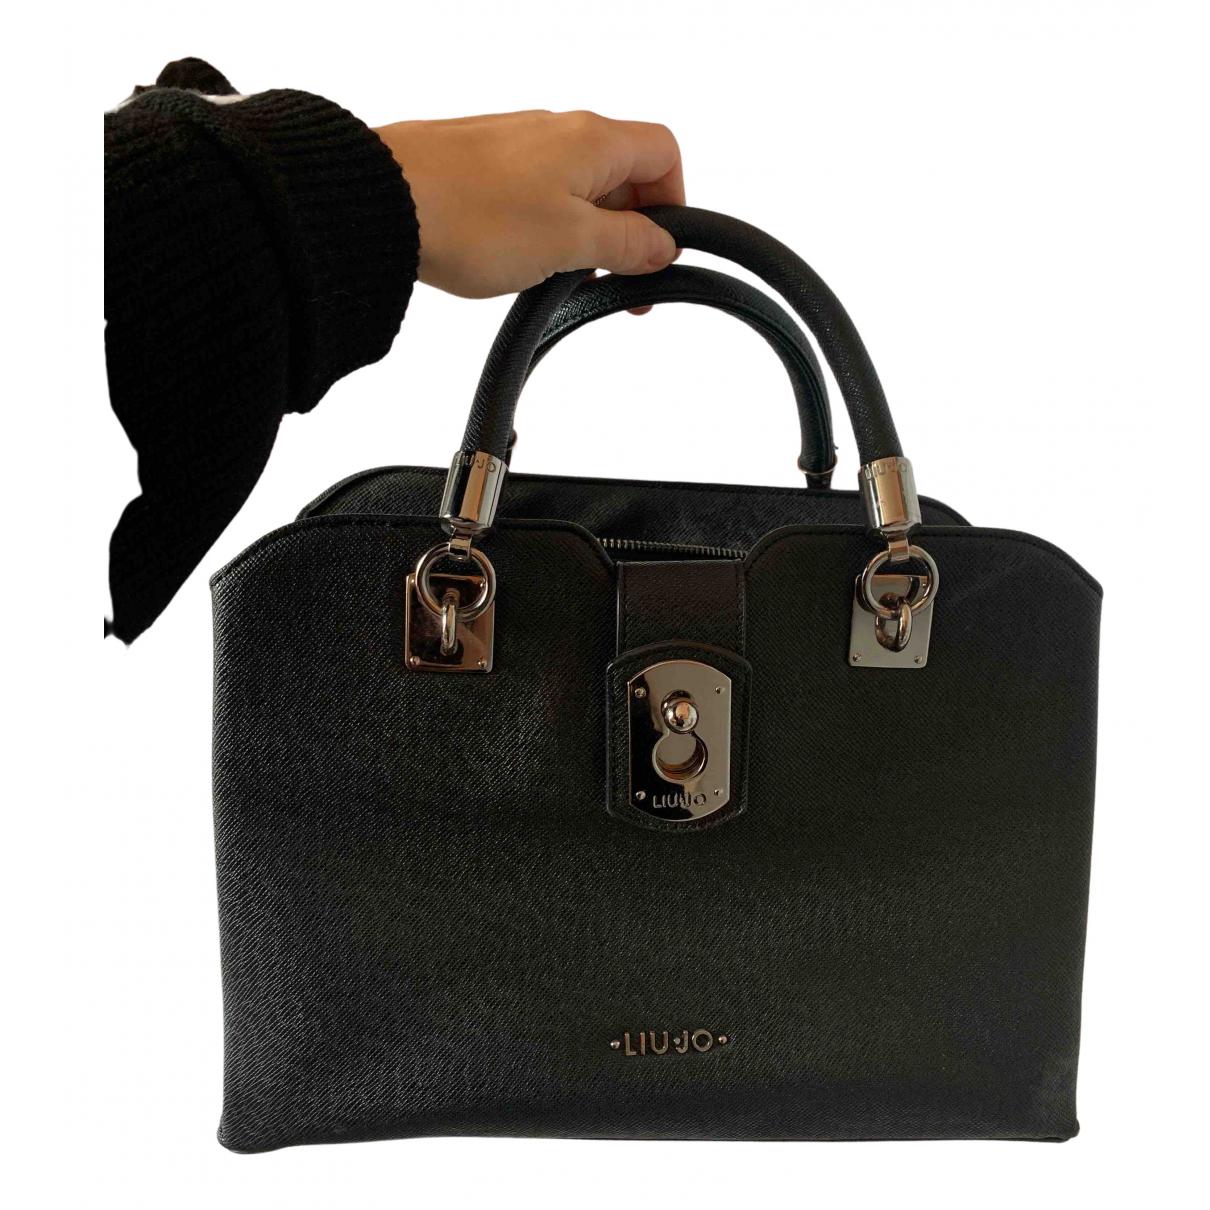 Liu.jo N Black Leather handbag for Women N